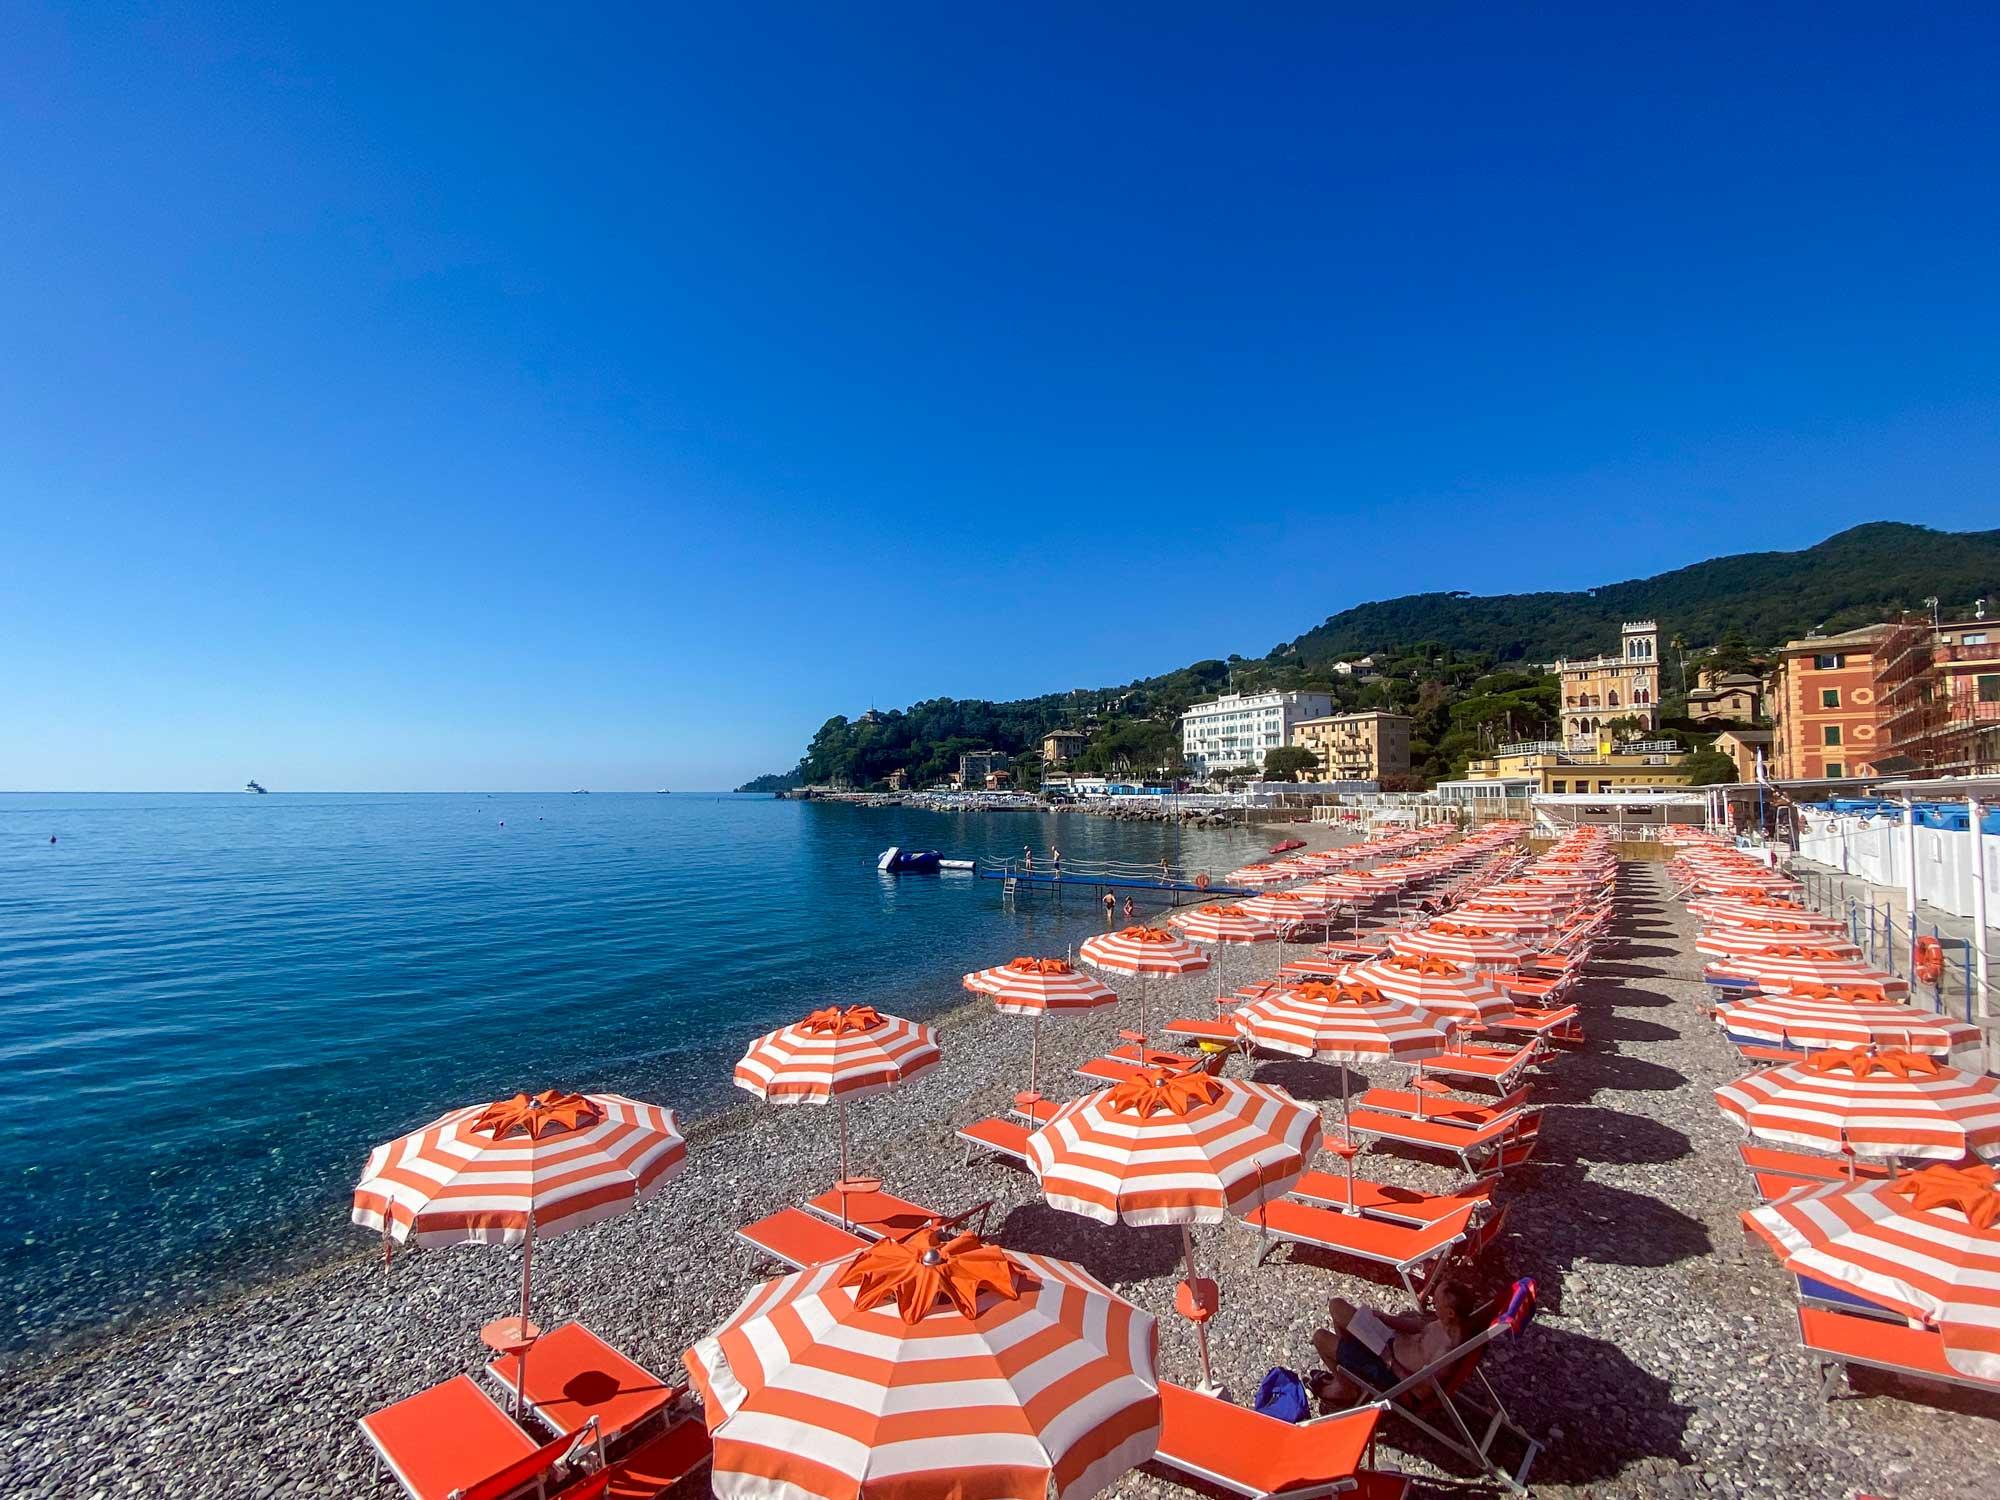 Spiaggia dei Bagni Sirena - Santa Margherita Ligure